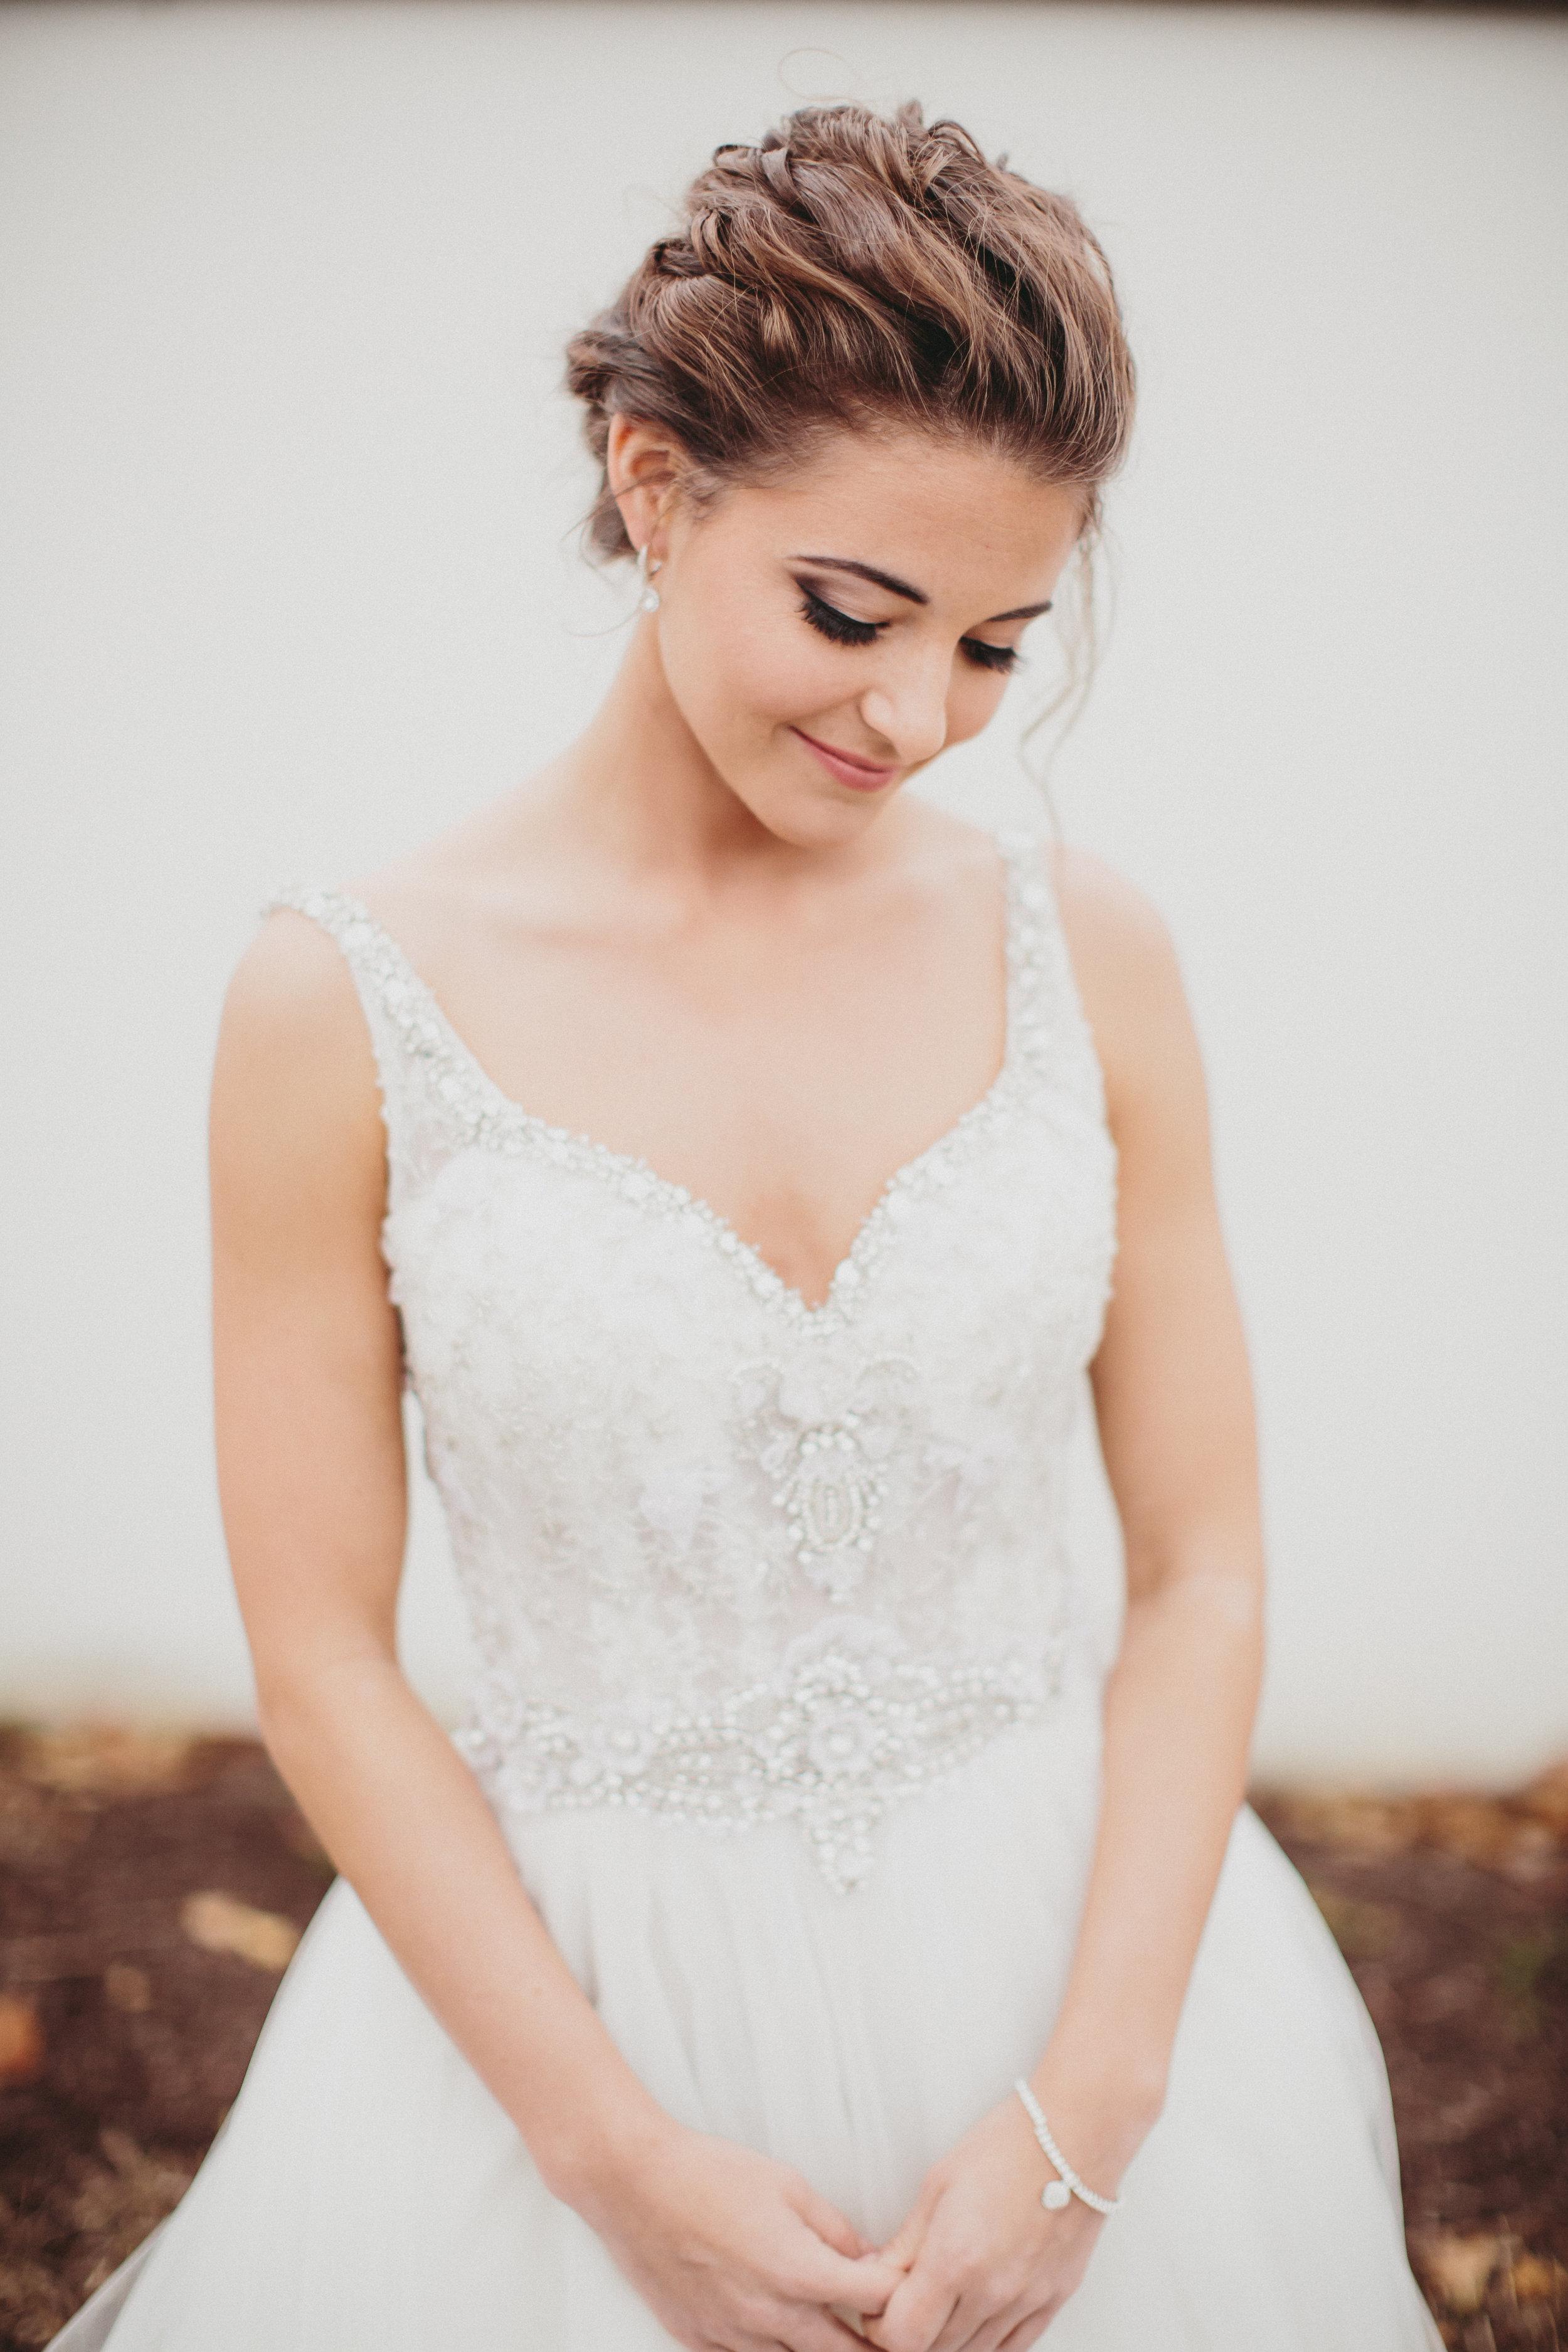 the_carrs_photography_chelsea_kirk_wedding_0241.jpg